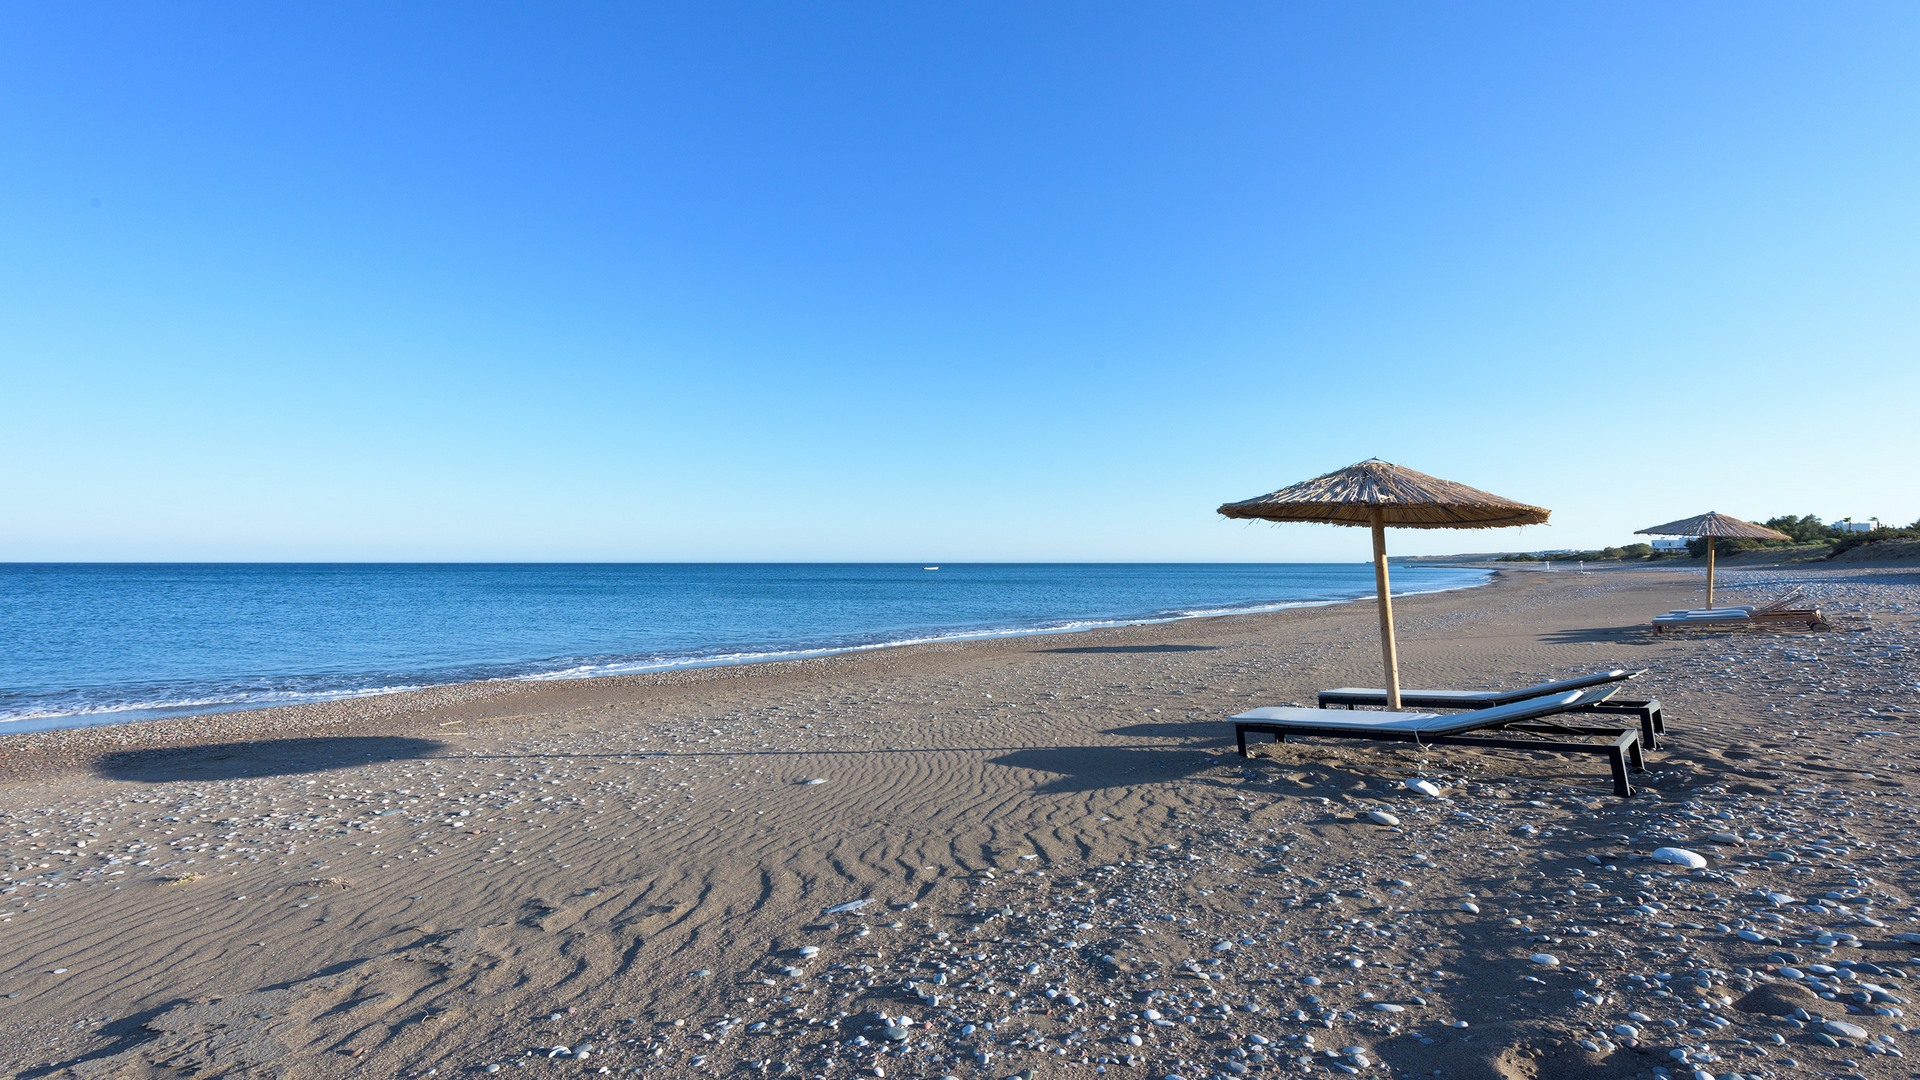 Beach-3 (Копия)